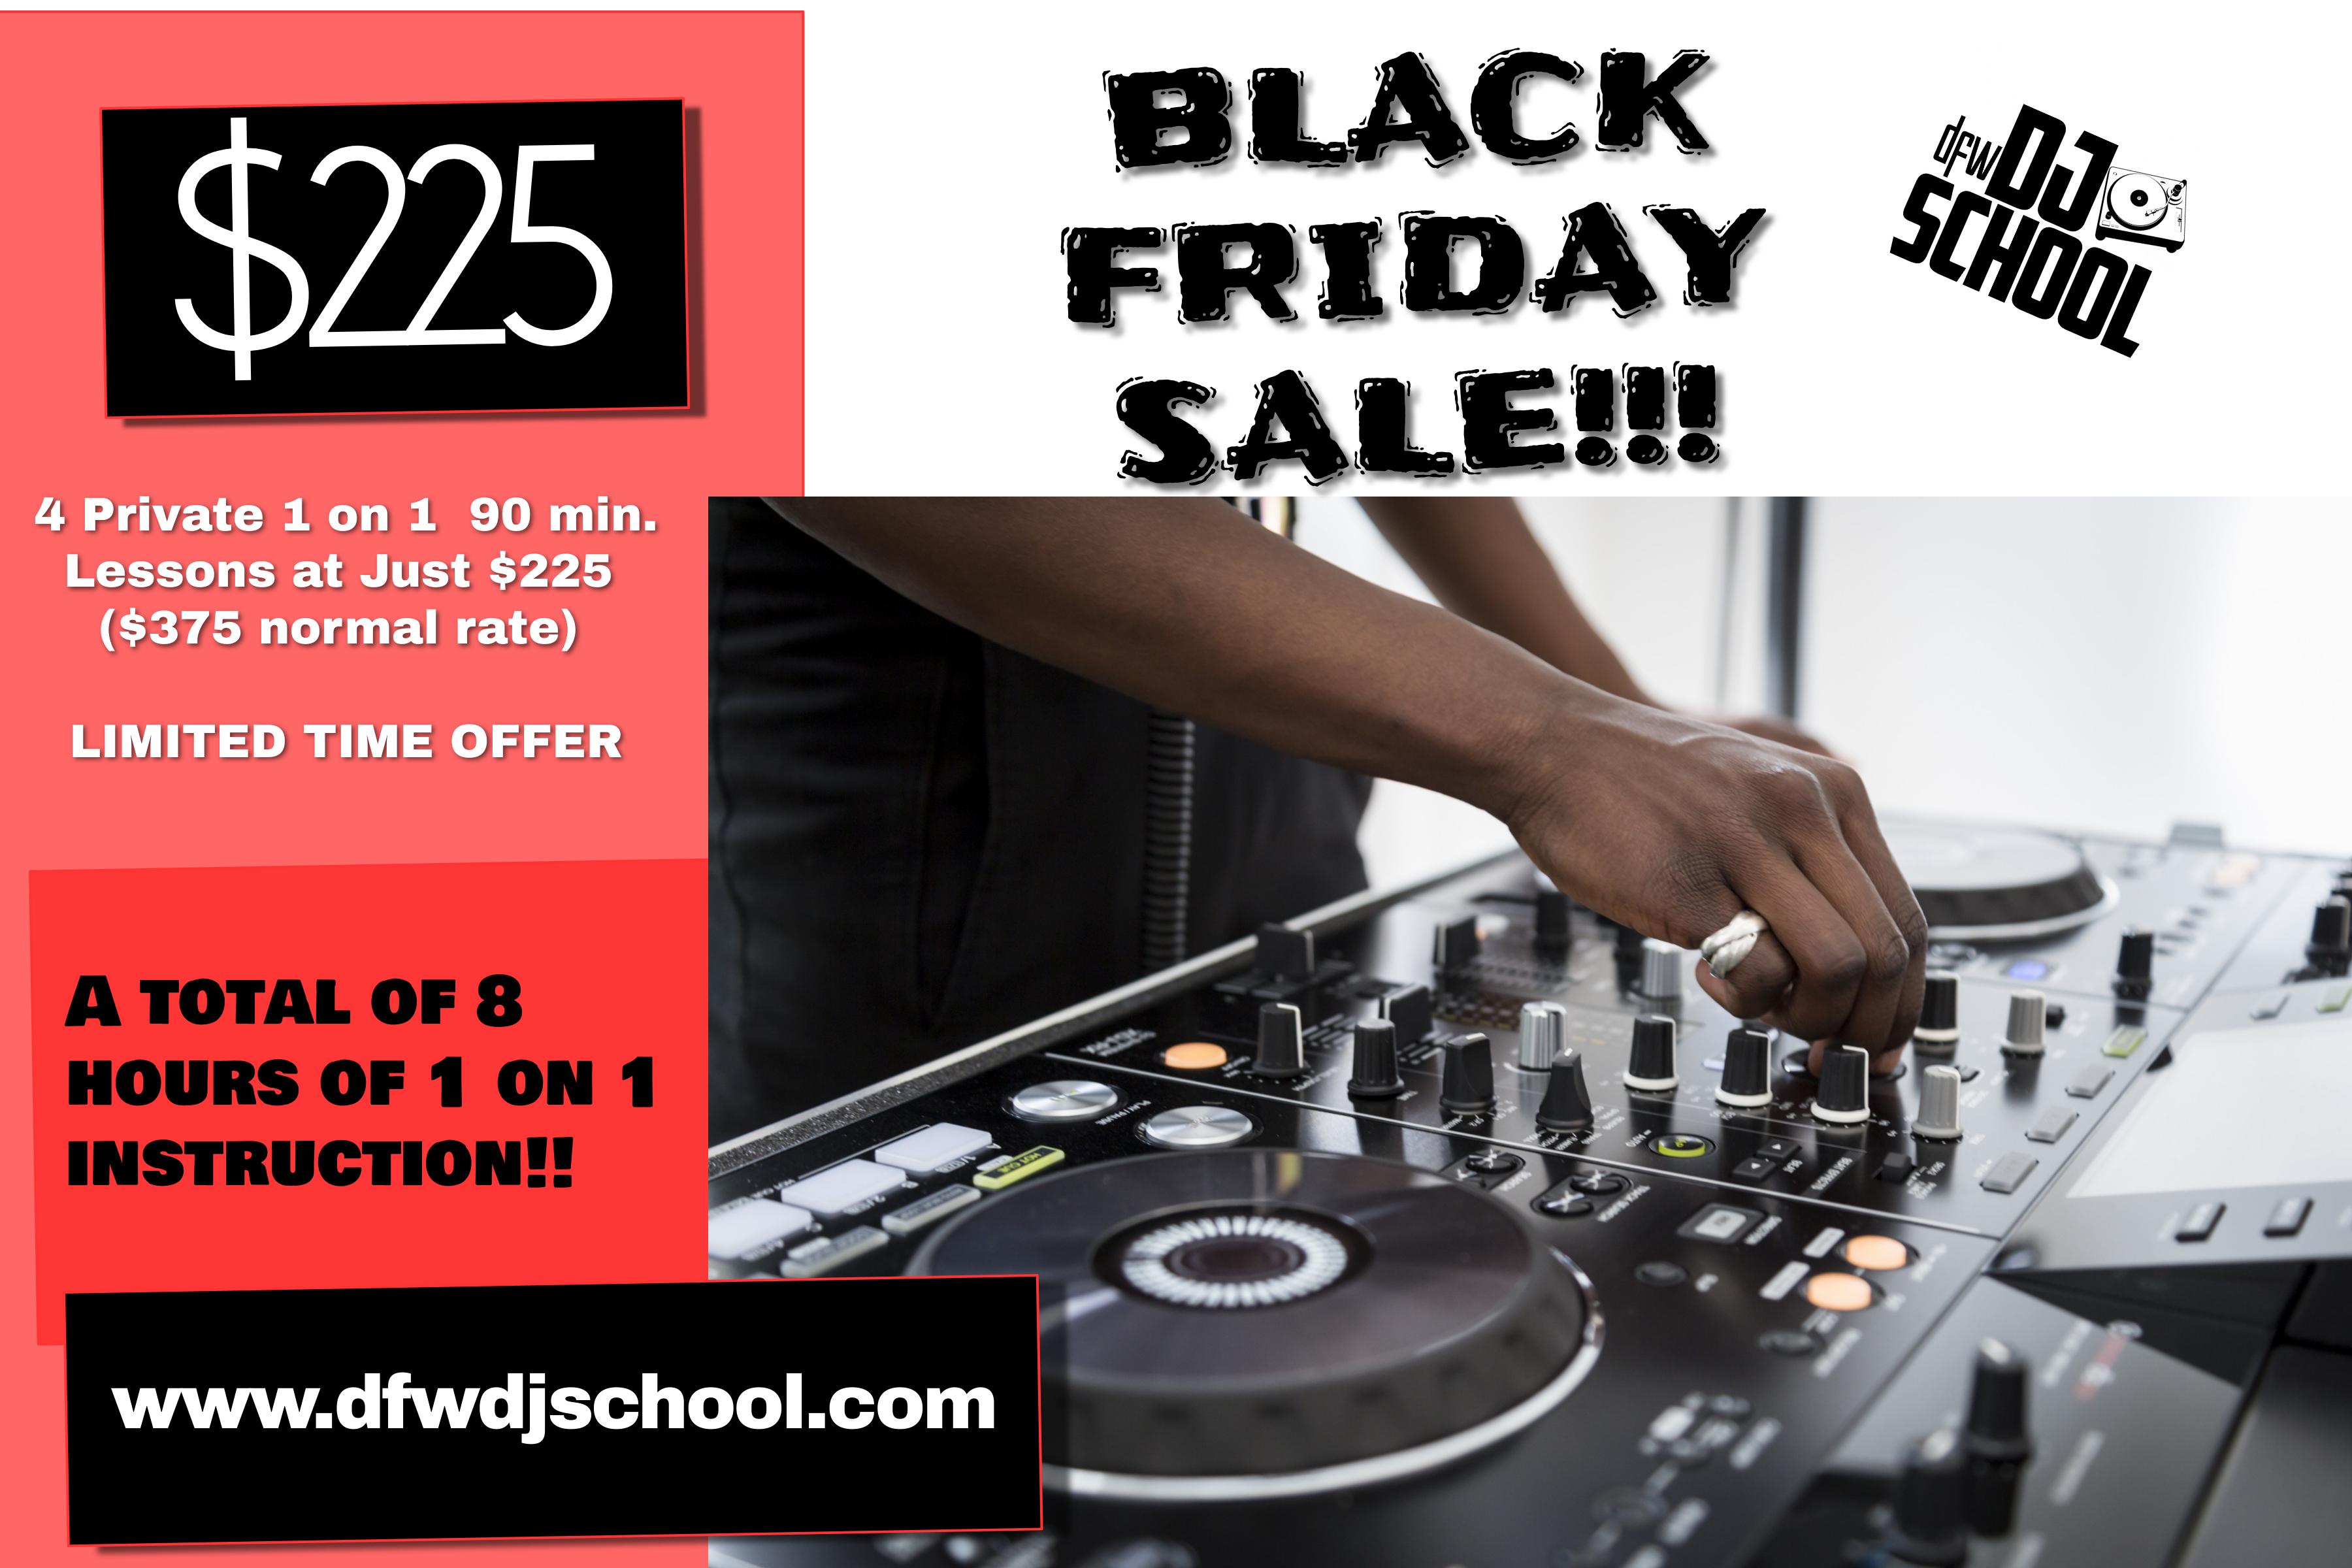 Black Friday 2020 Savings